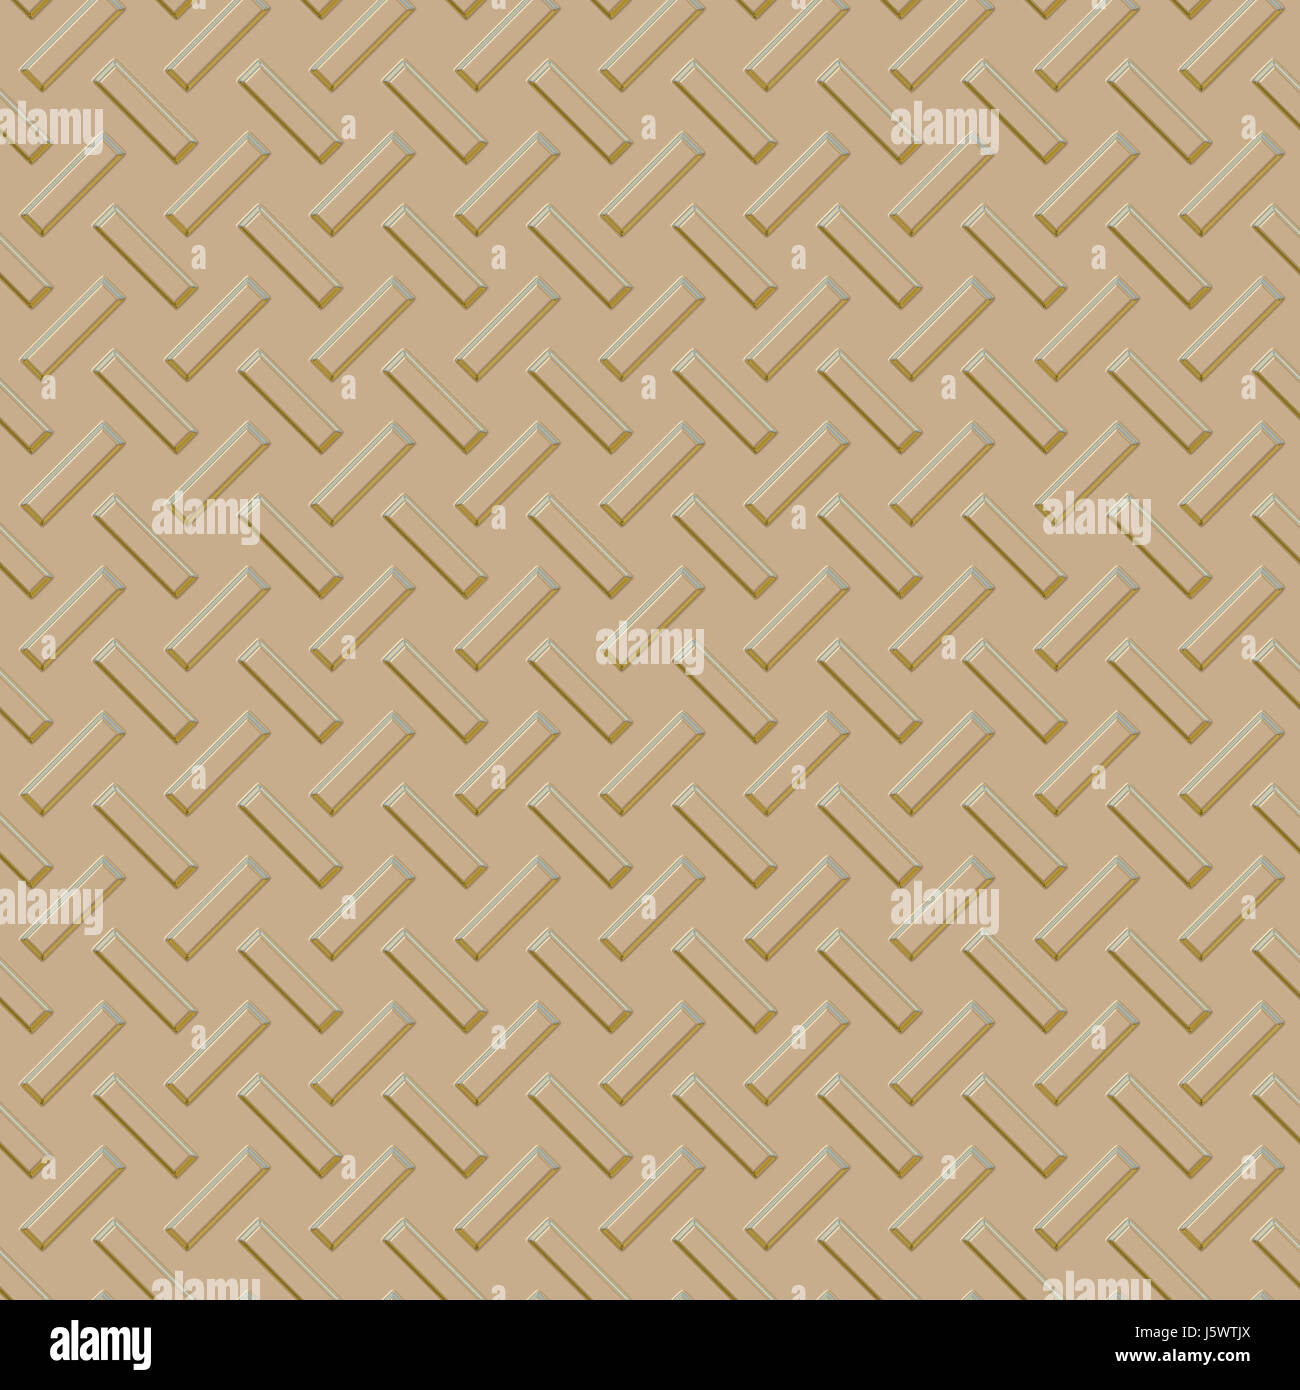 Metal Brass Wallpaper Metallic Backdrop Background Texture Diamond Plate